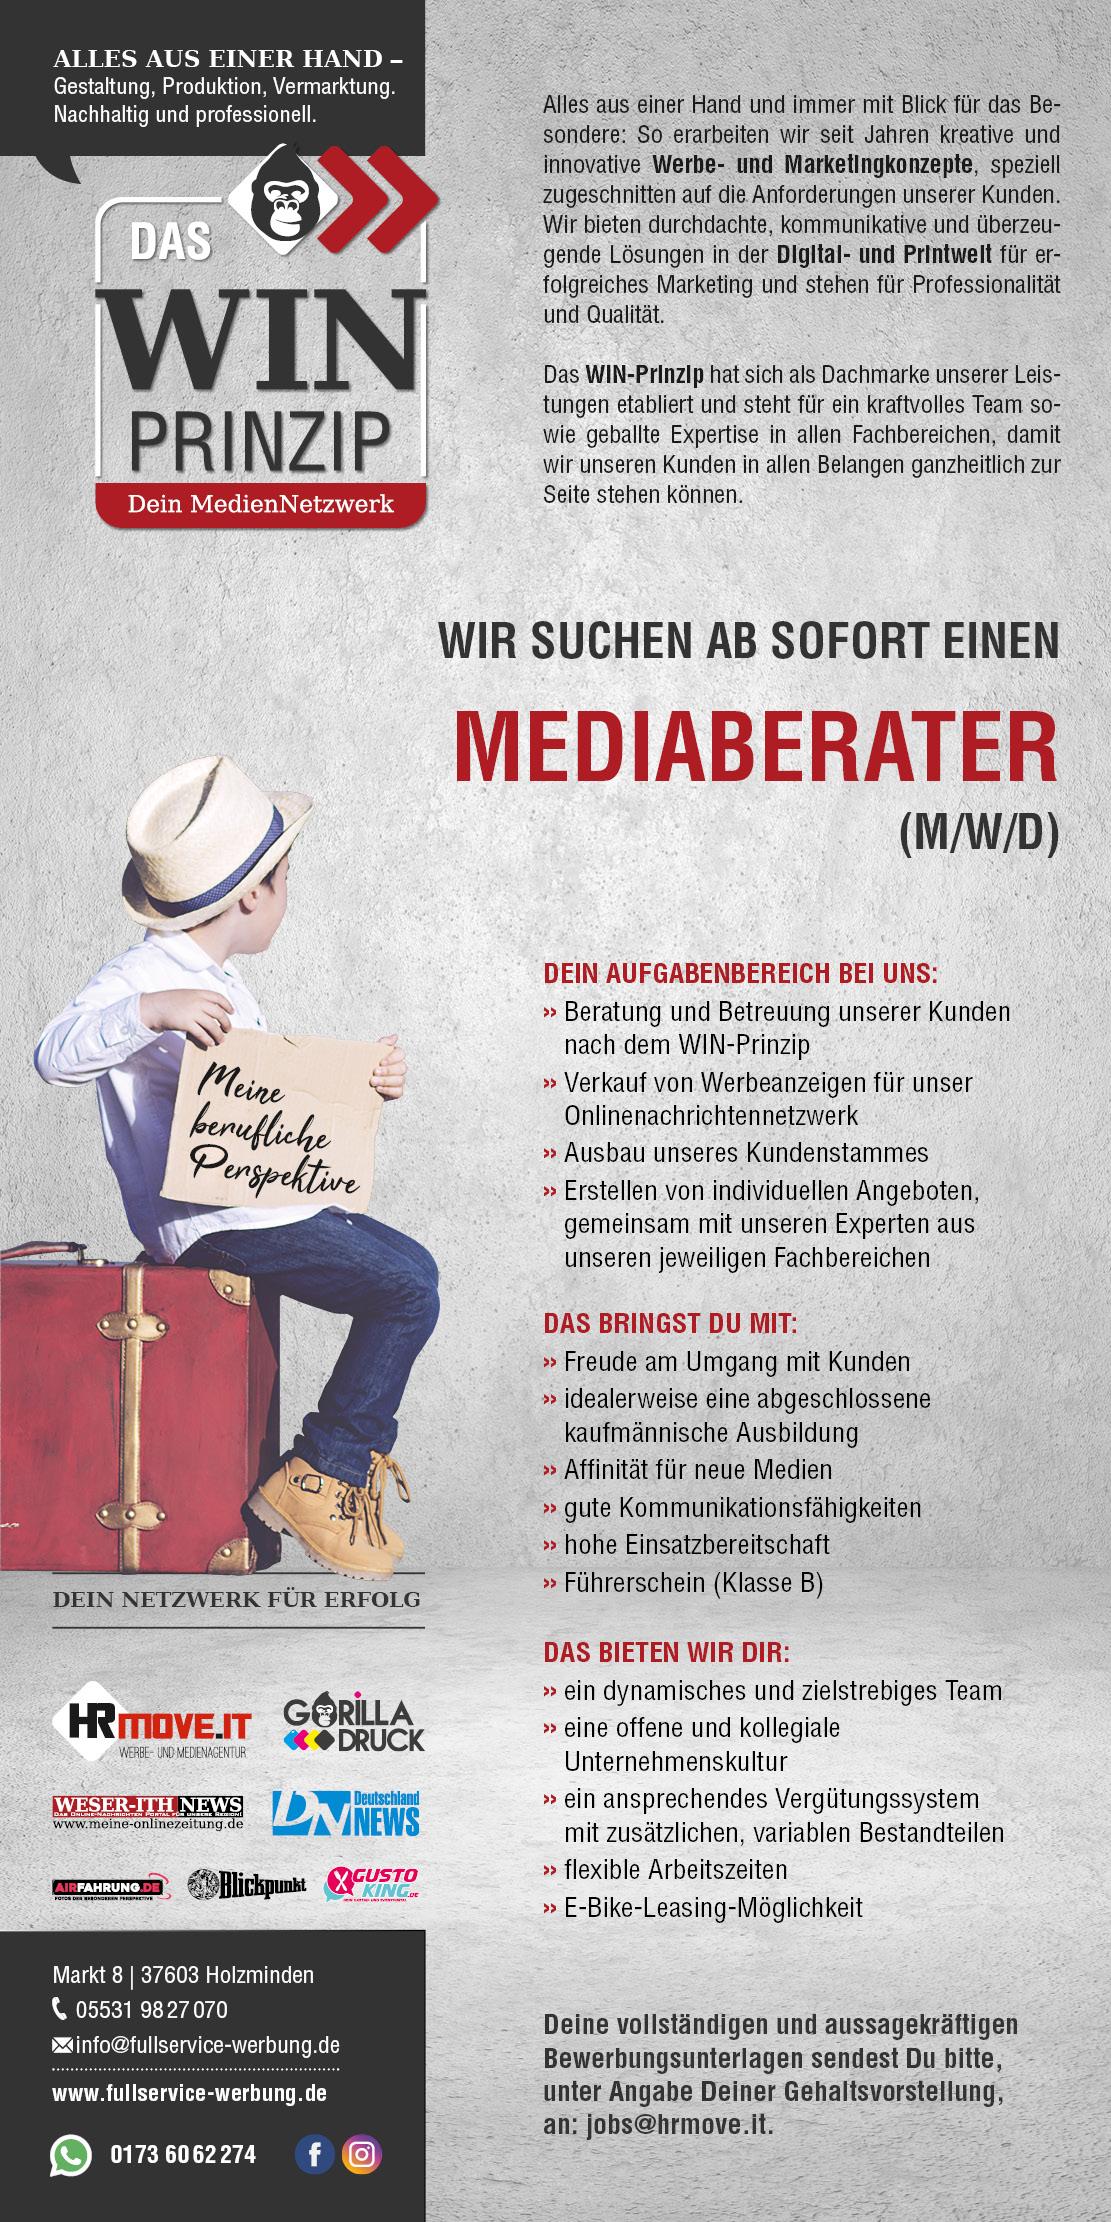 Mediaberater (m/w/d) - DAS WIN PRINZIP